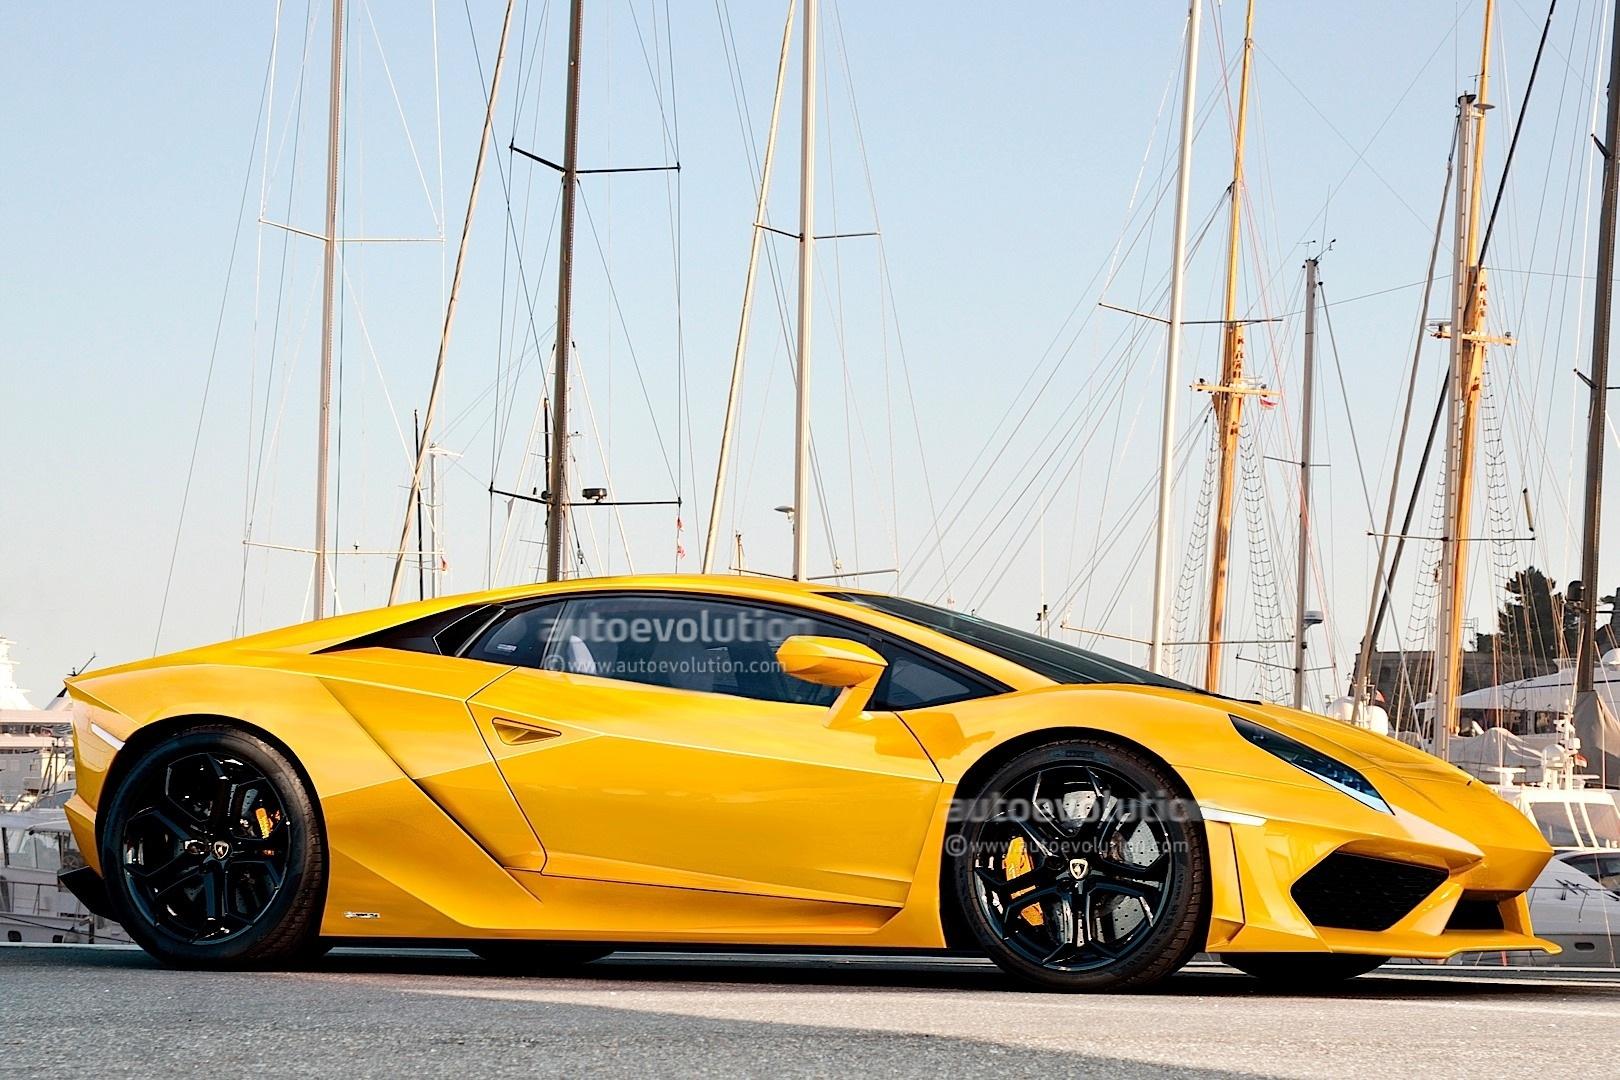 2013 - [Lamborghini] Huracán LP610-4  - Page 2 2015-lamborghini-cabrera-lp600-4-coupe-rendering-looking-sharp-65889_1